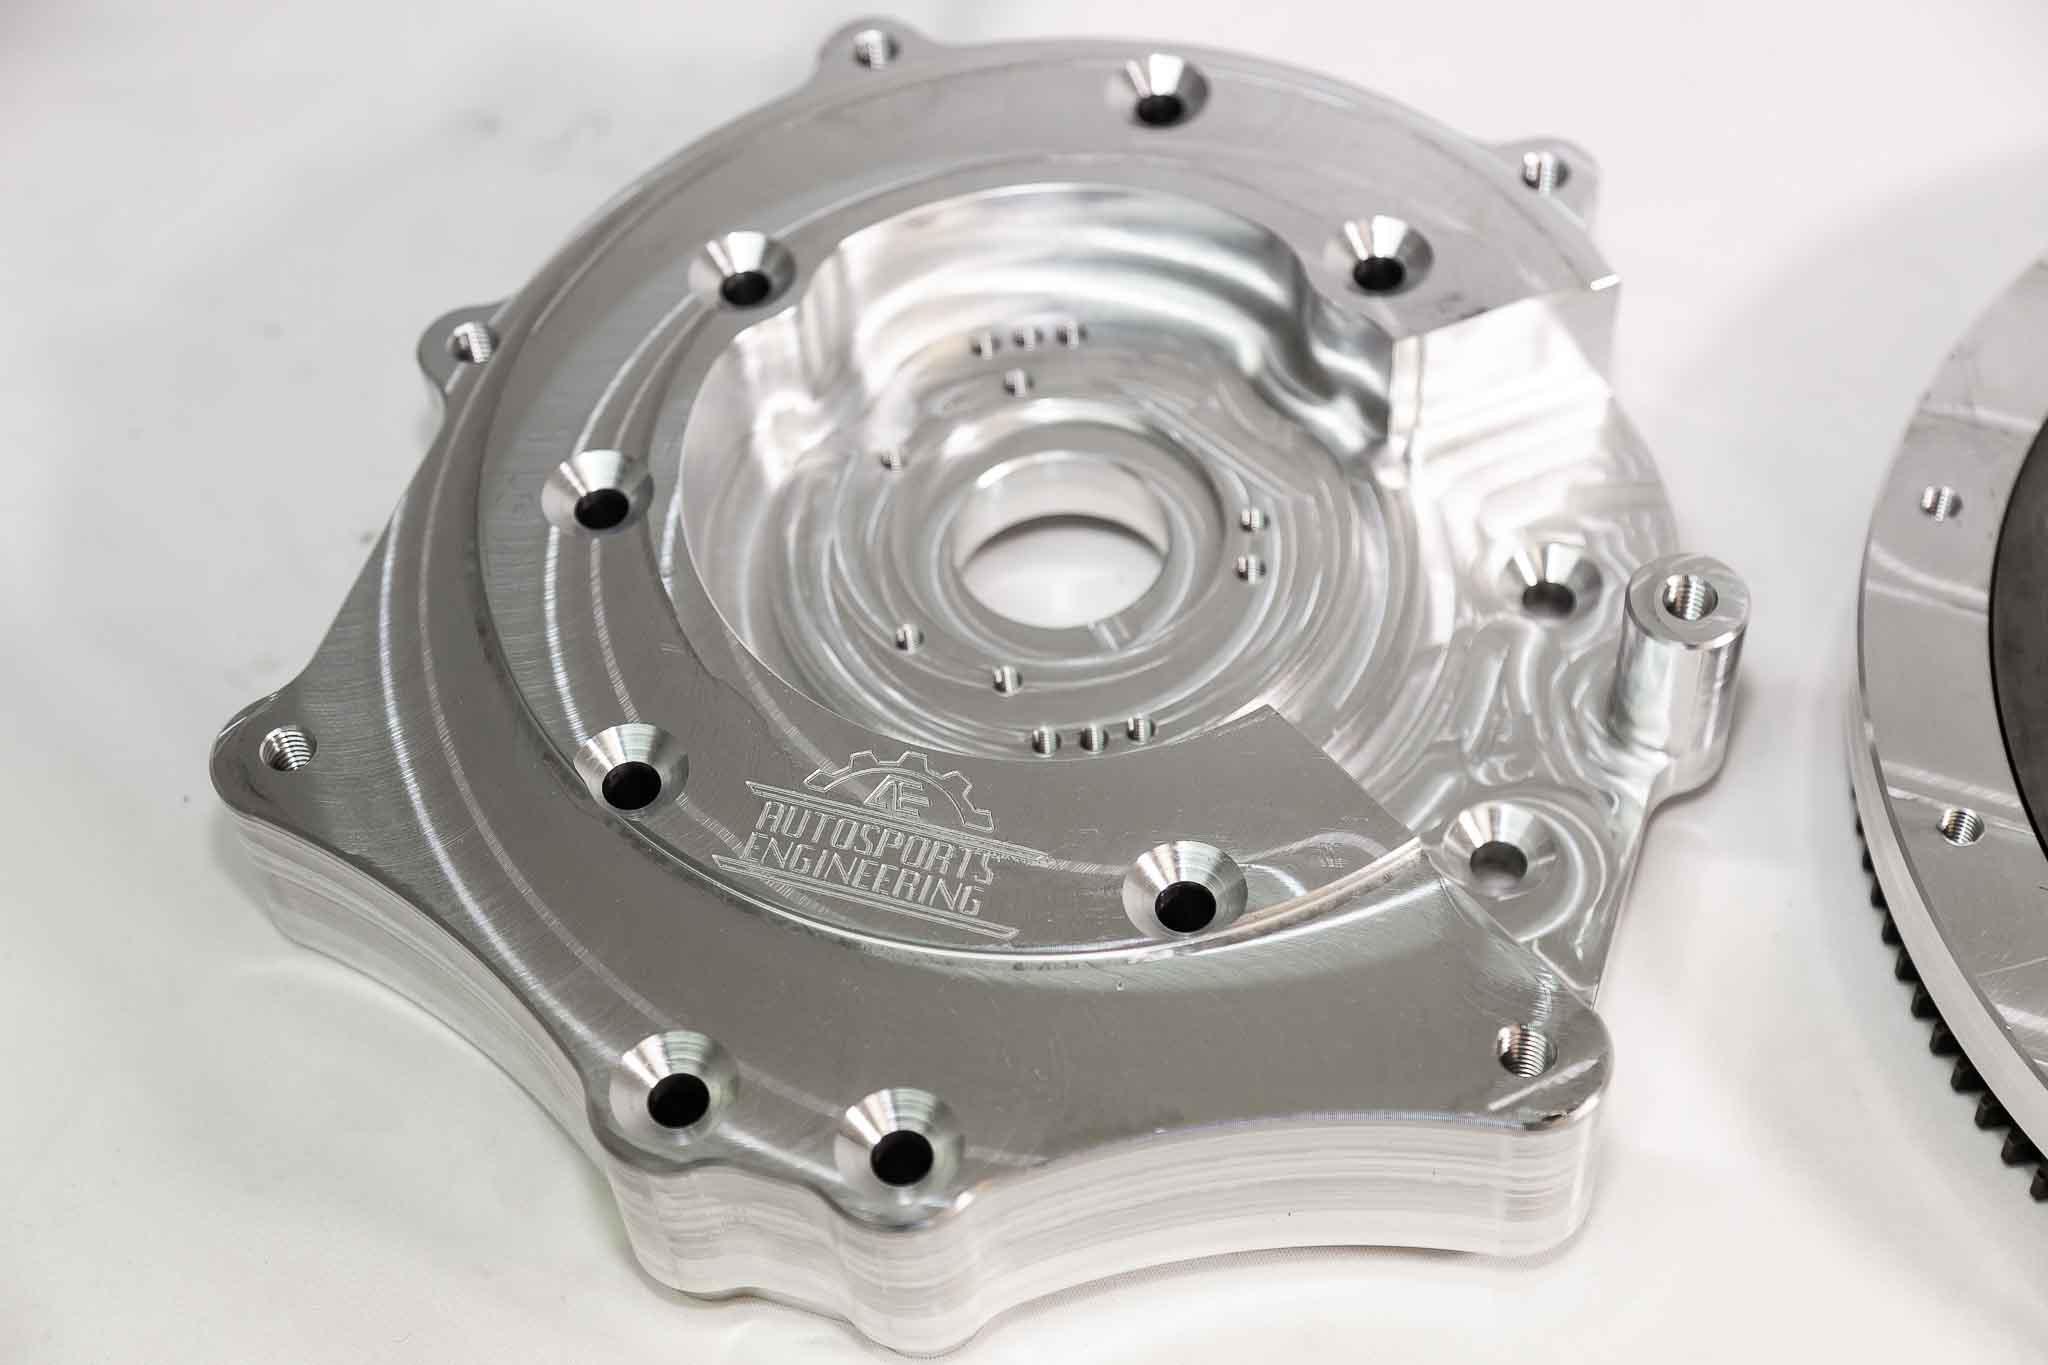 Autosports Engineering Supra MKIII 2JZGTE 2JZ 1JZ 2JZGE Engine to 350Z  CD009 Transmission Adapter - Package